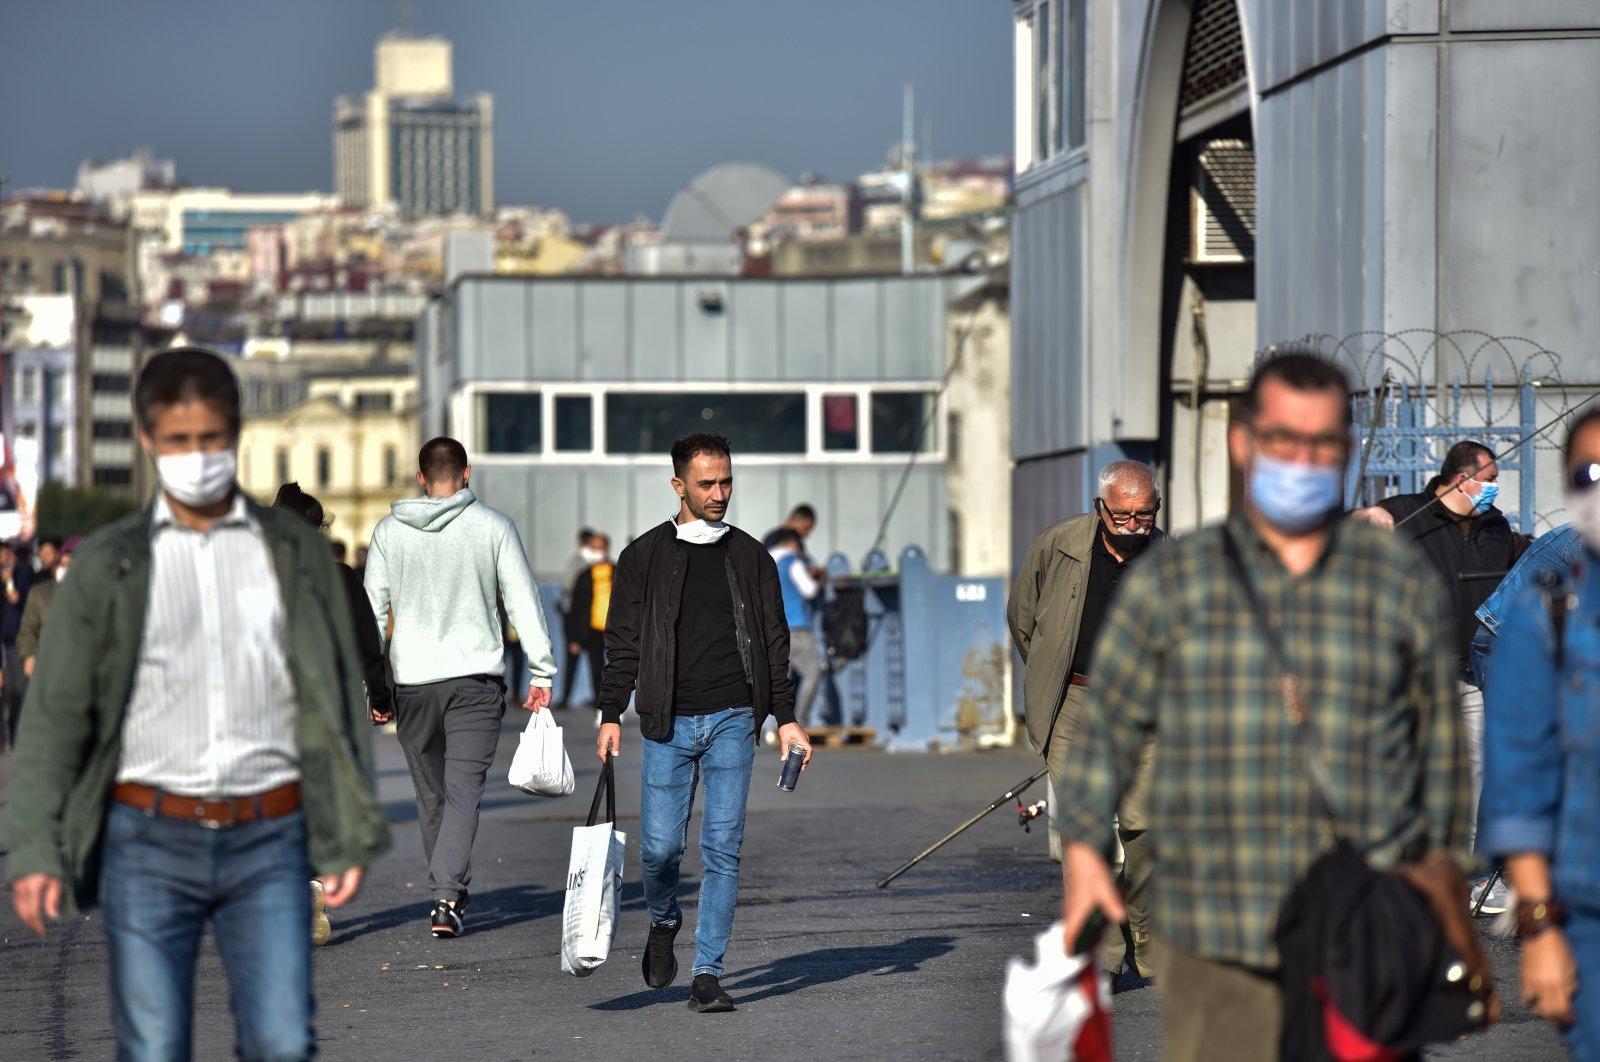 People walk on the Galata Bridge, in Istanbul, Turkey, Nov. 2, 2020. (DHA Photo)